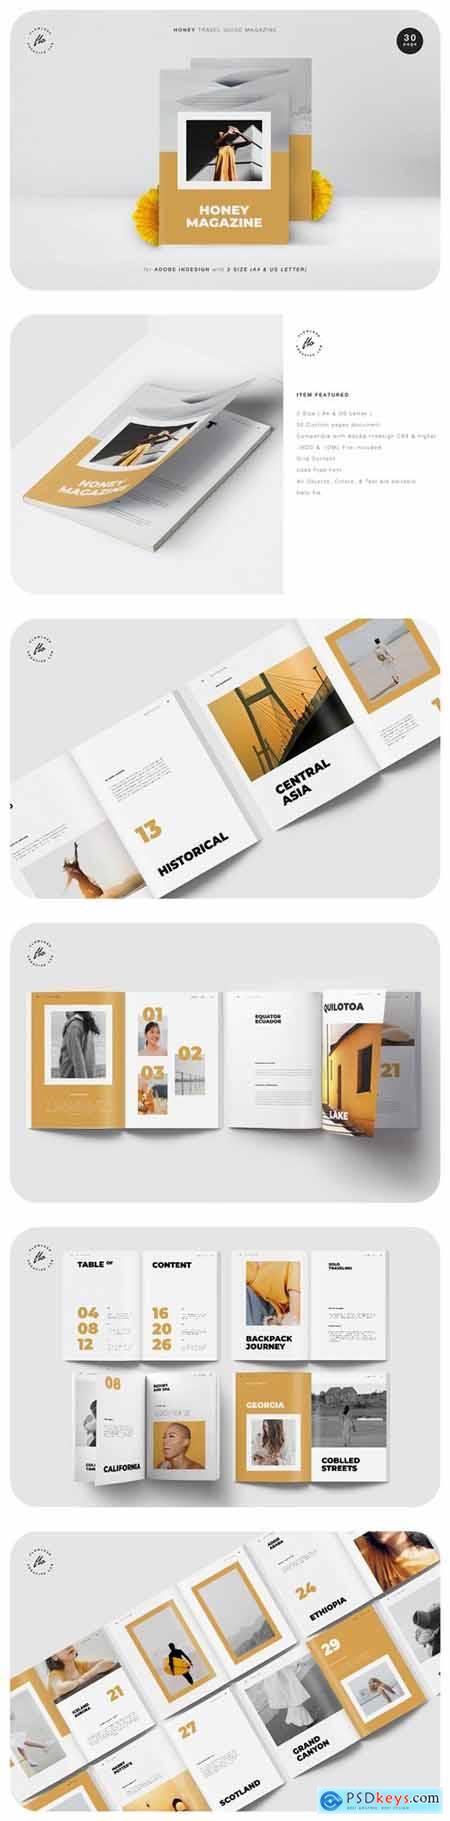 Honey Travel Guide Magazine